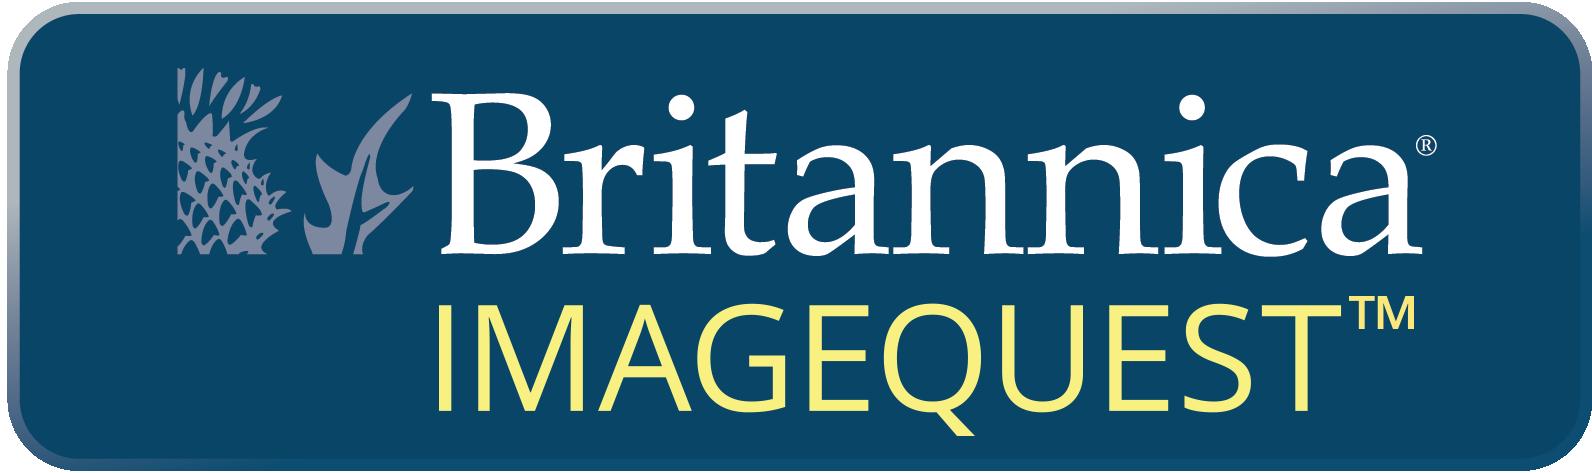 Encyclopedia Brittanica ImageQuest